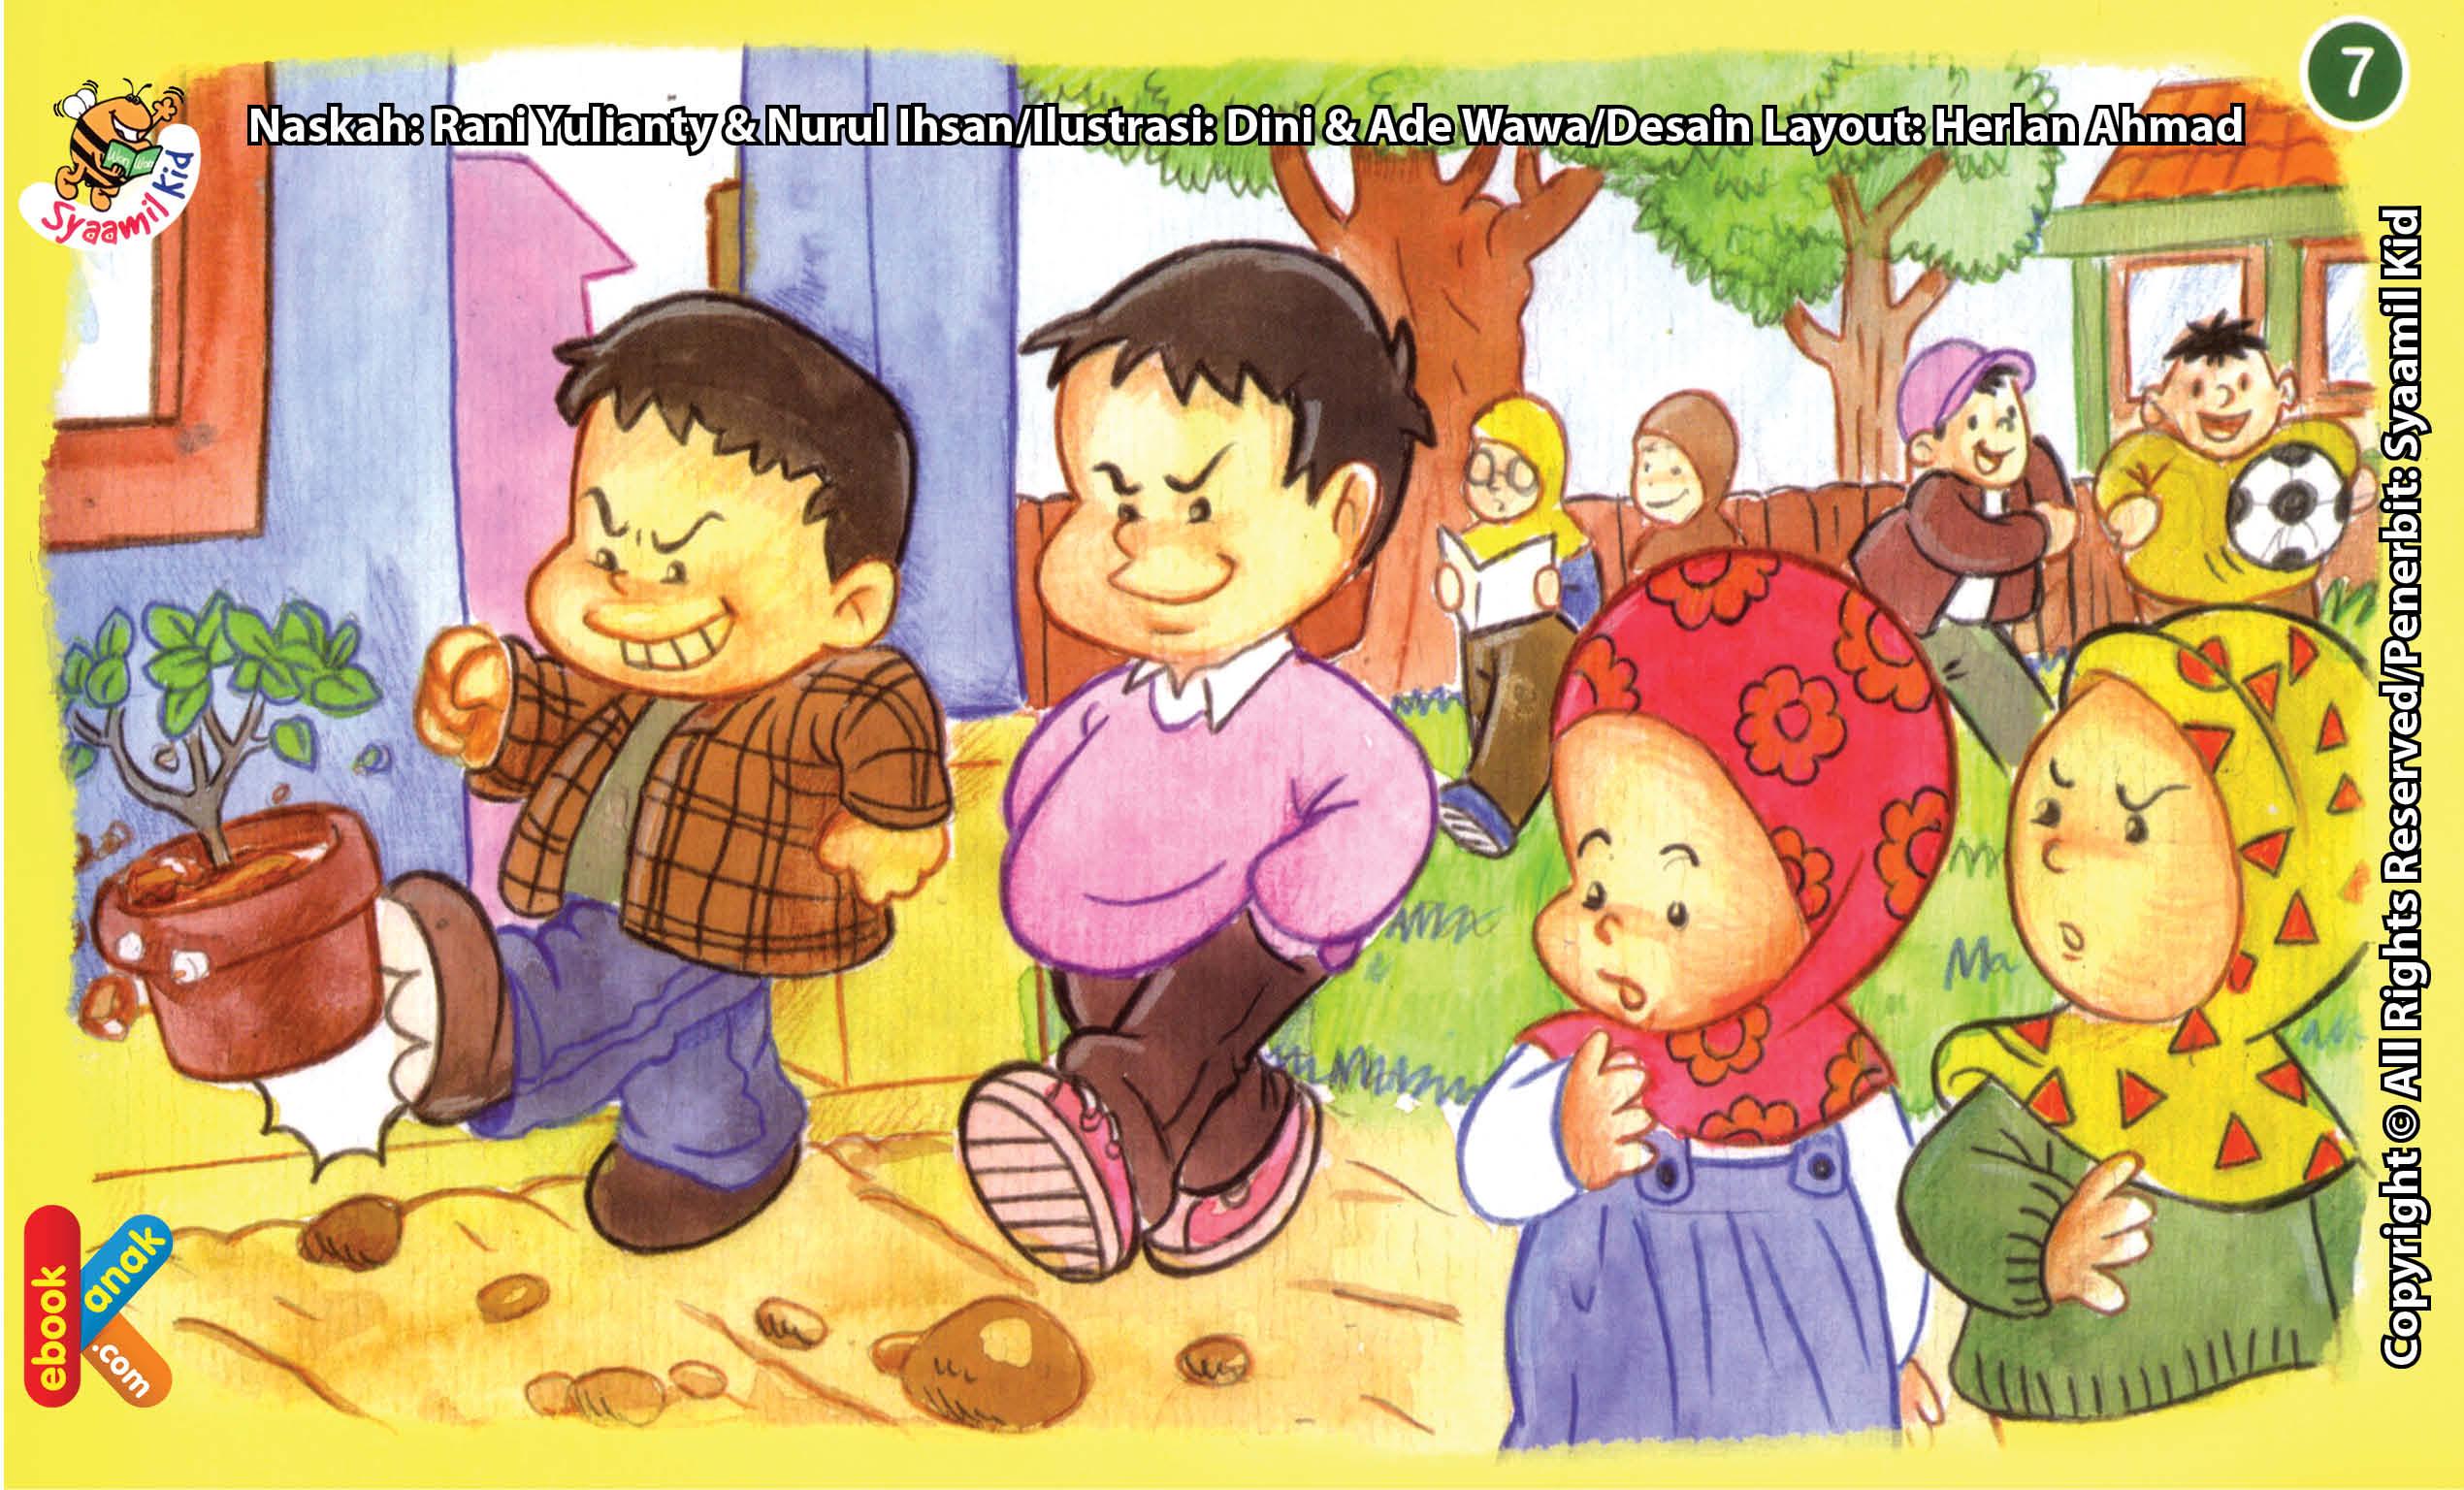 ilustrasi seri kebiasaan anak shalih berteman dengan anak shalih